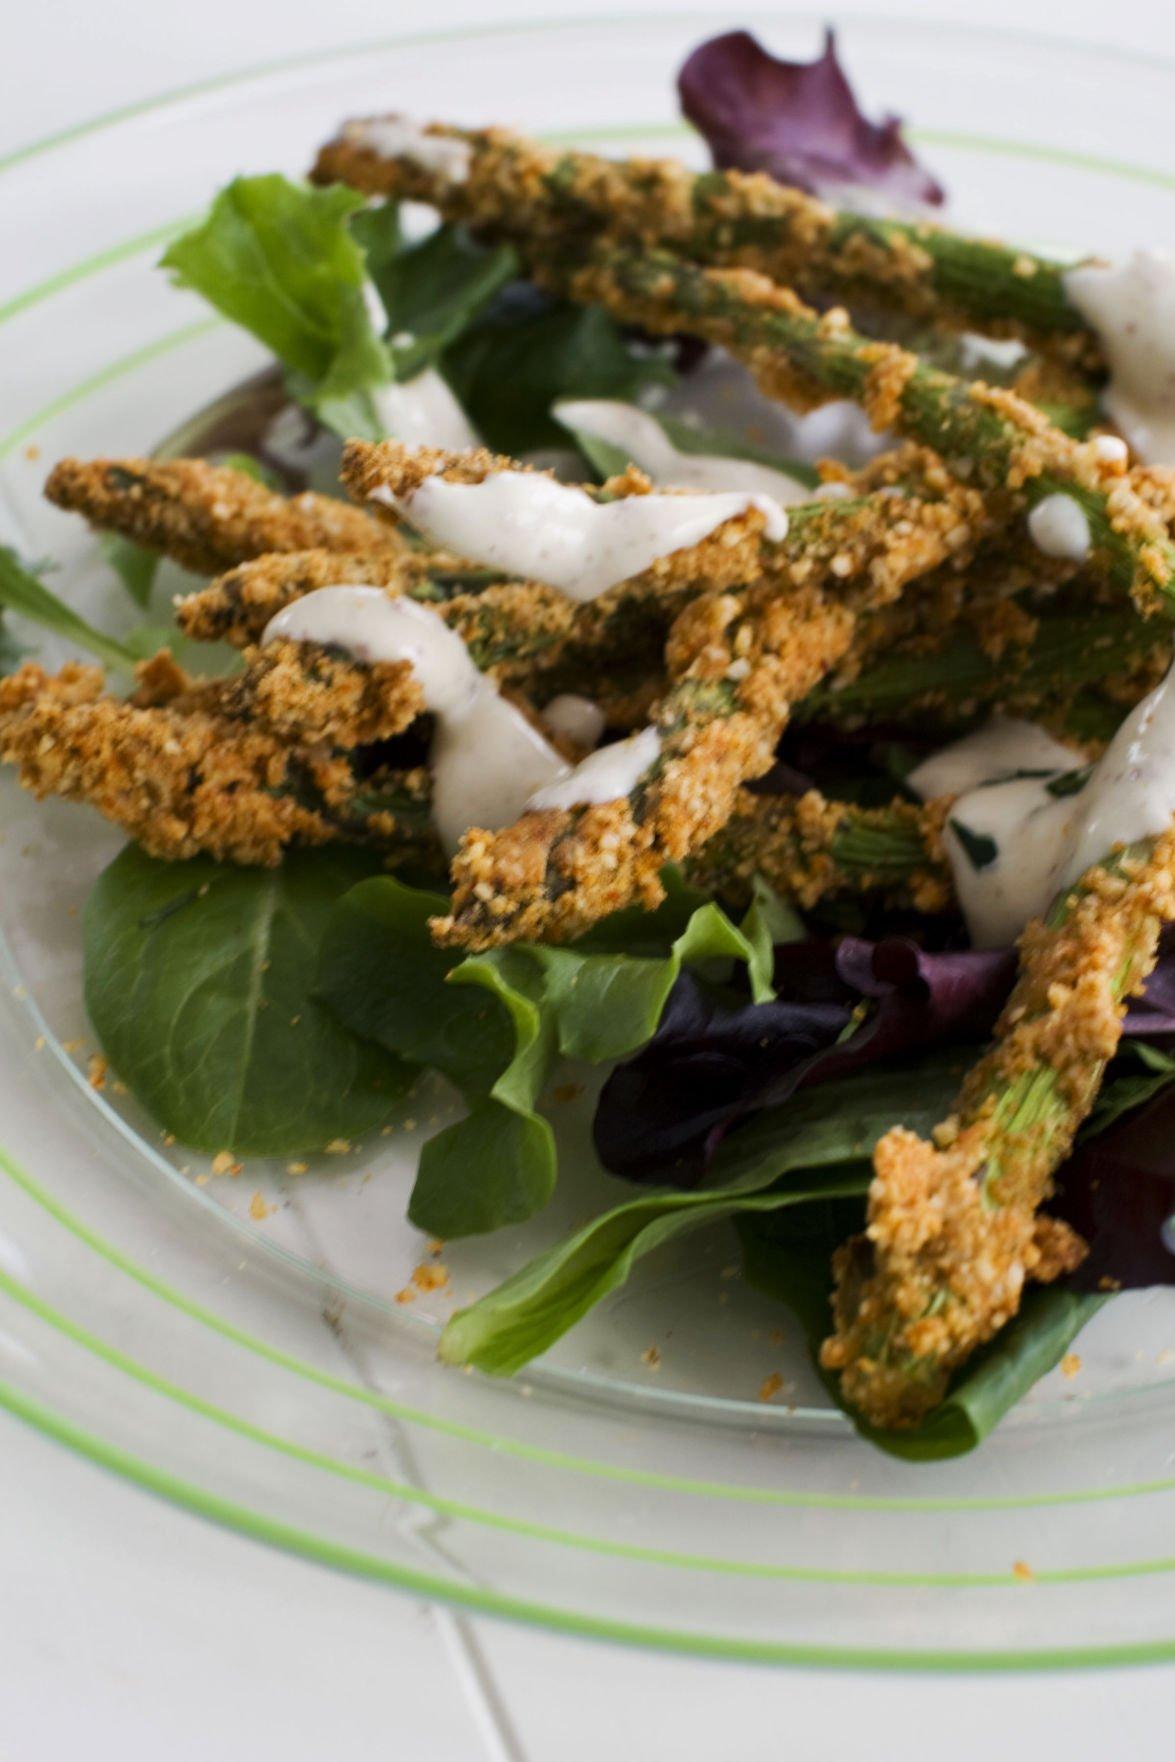 Asparagus goes 'fried'